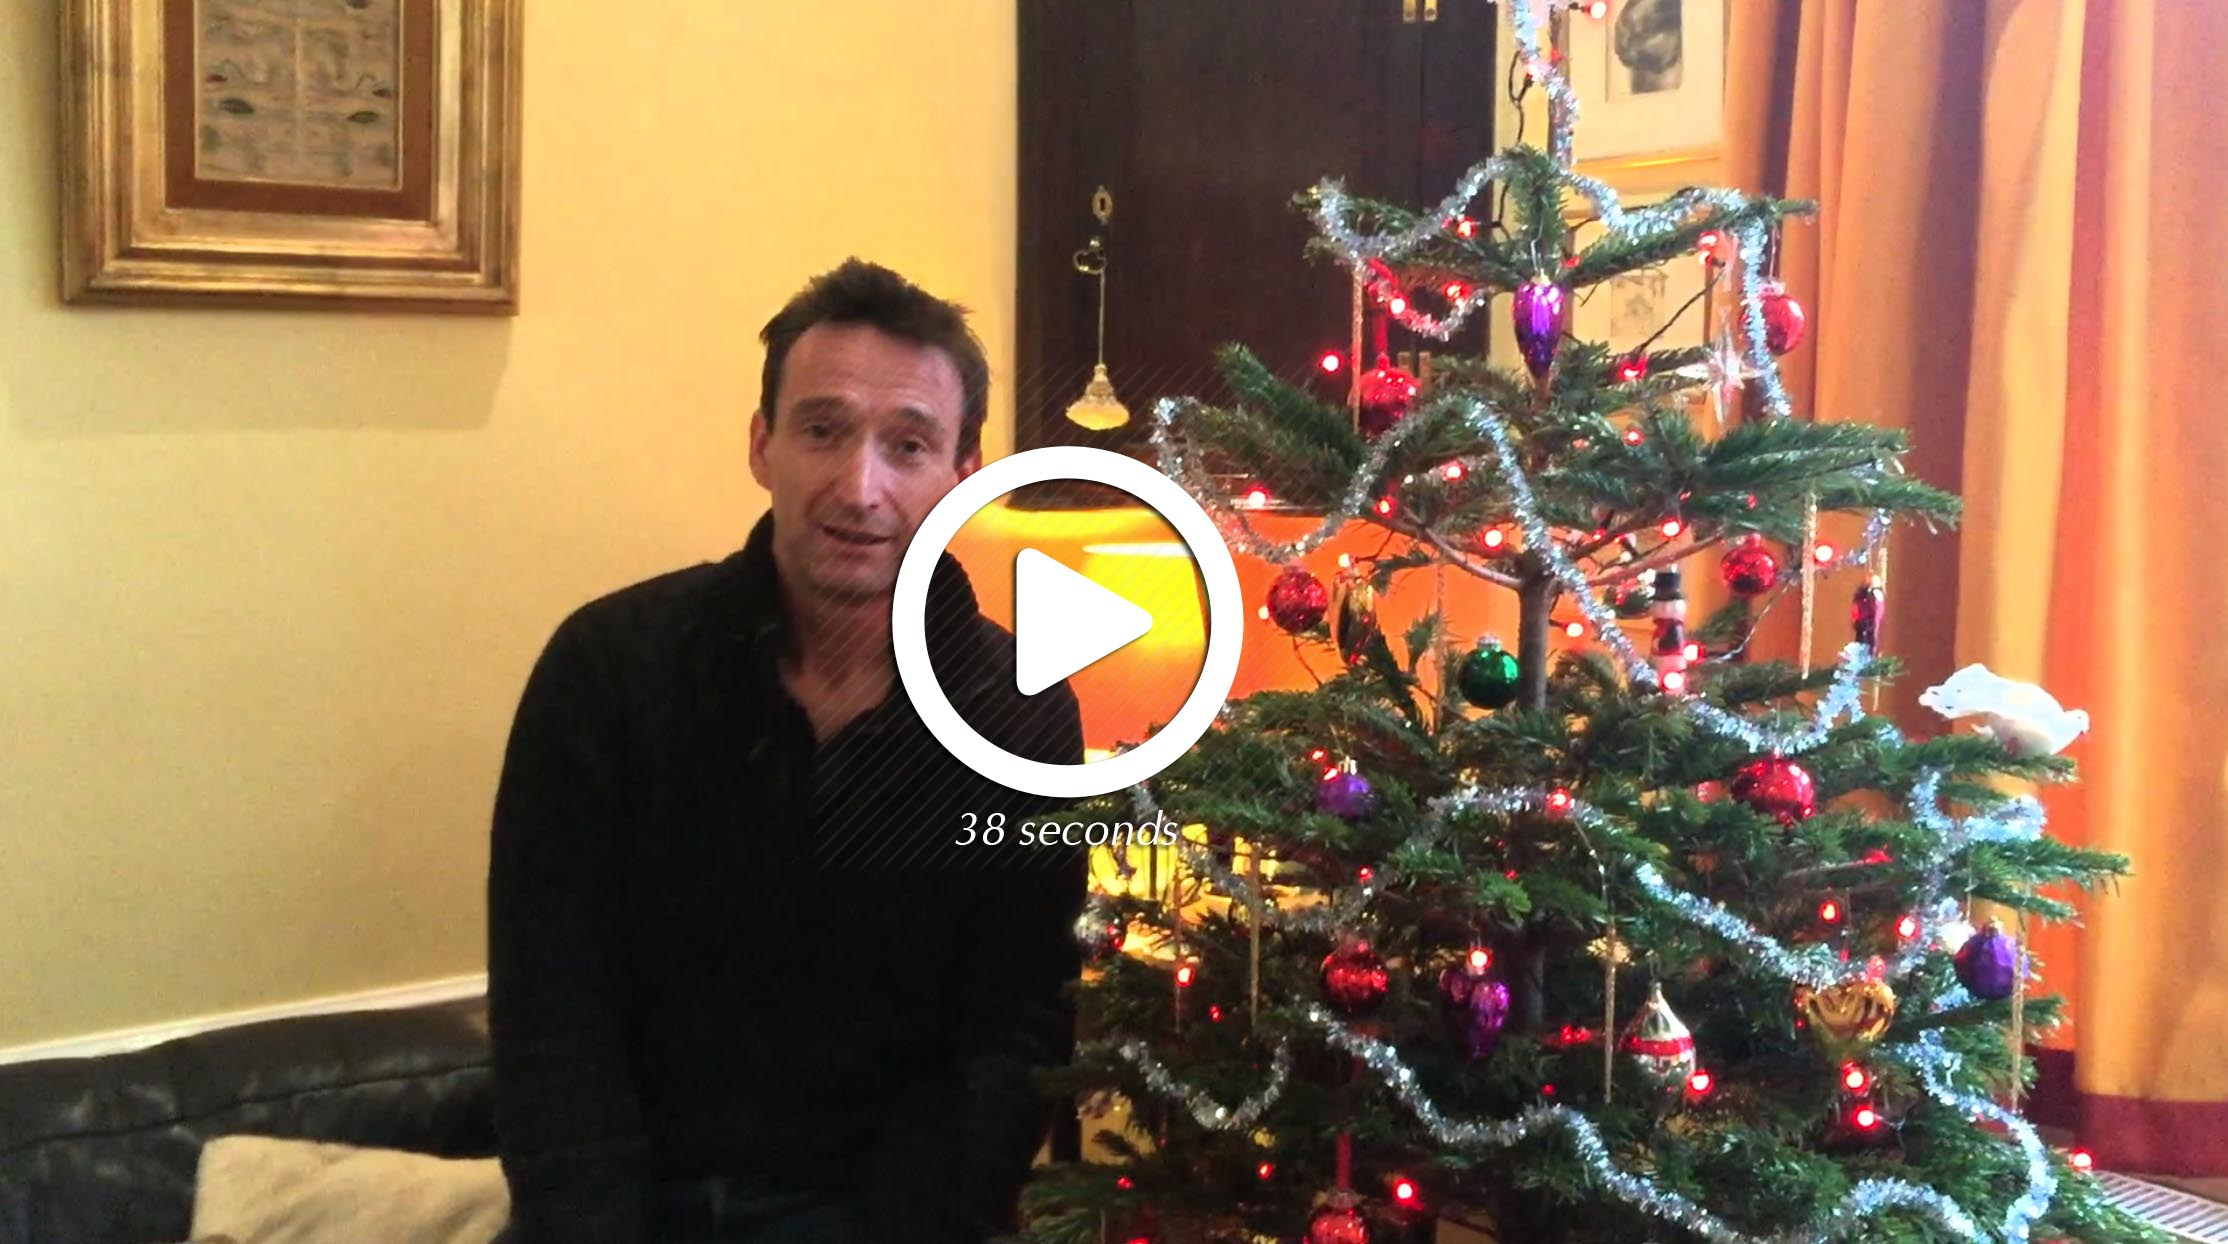 Merry Christmas from John Leech!